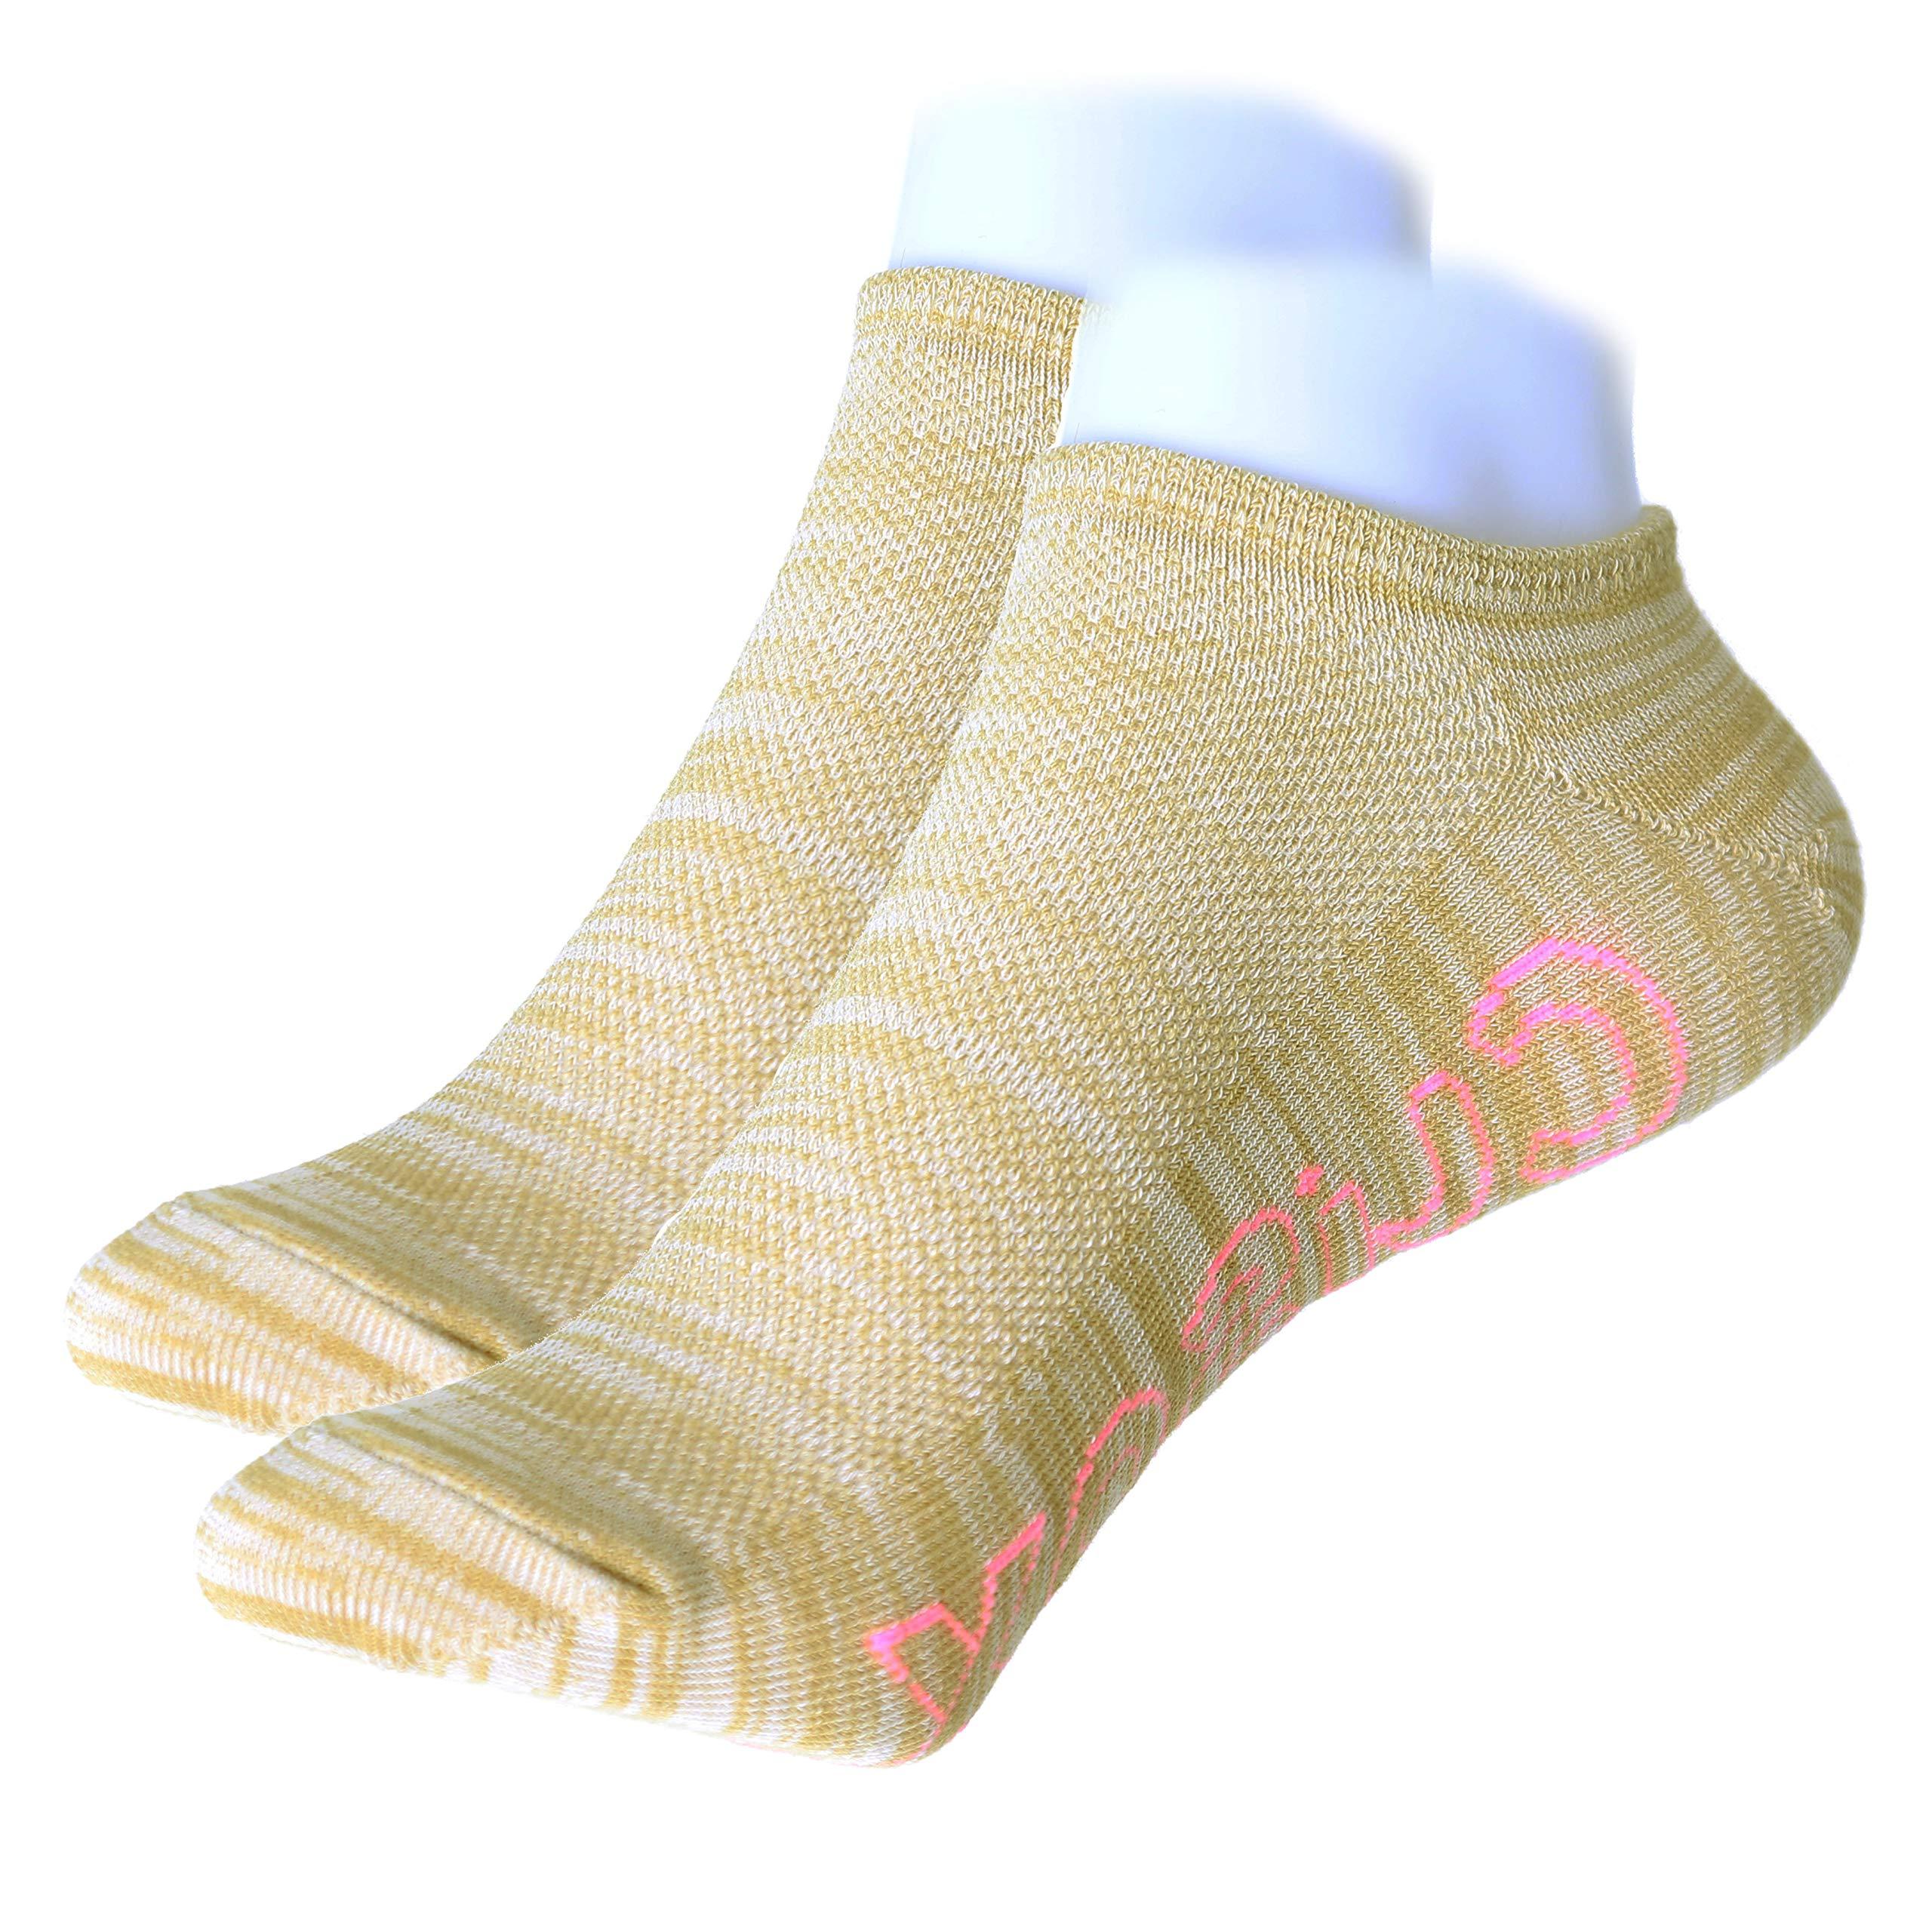 CUSOX Women\'s No Show Antibacterial Odor Free Socks with Seamless Toe 3 Pairs